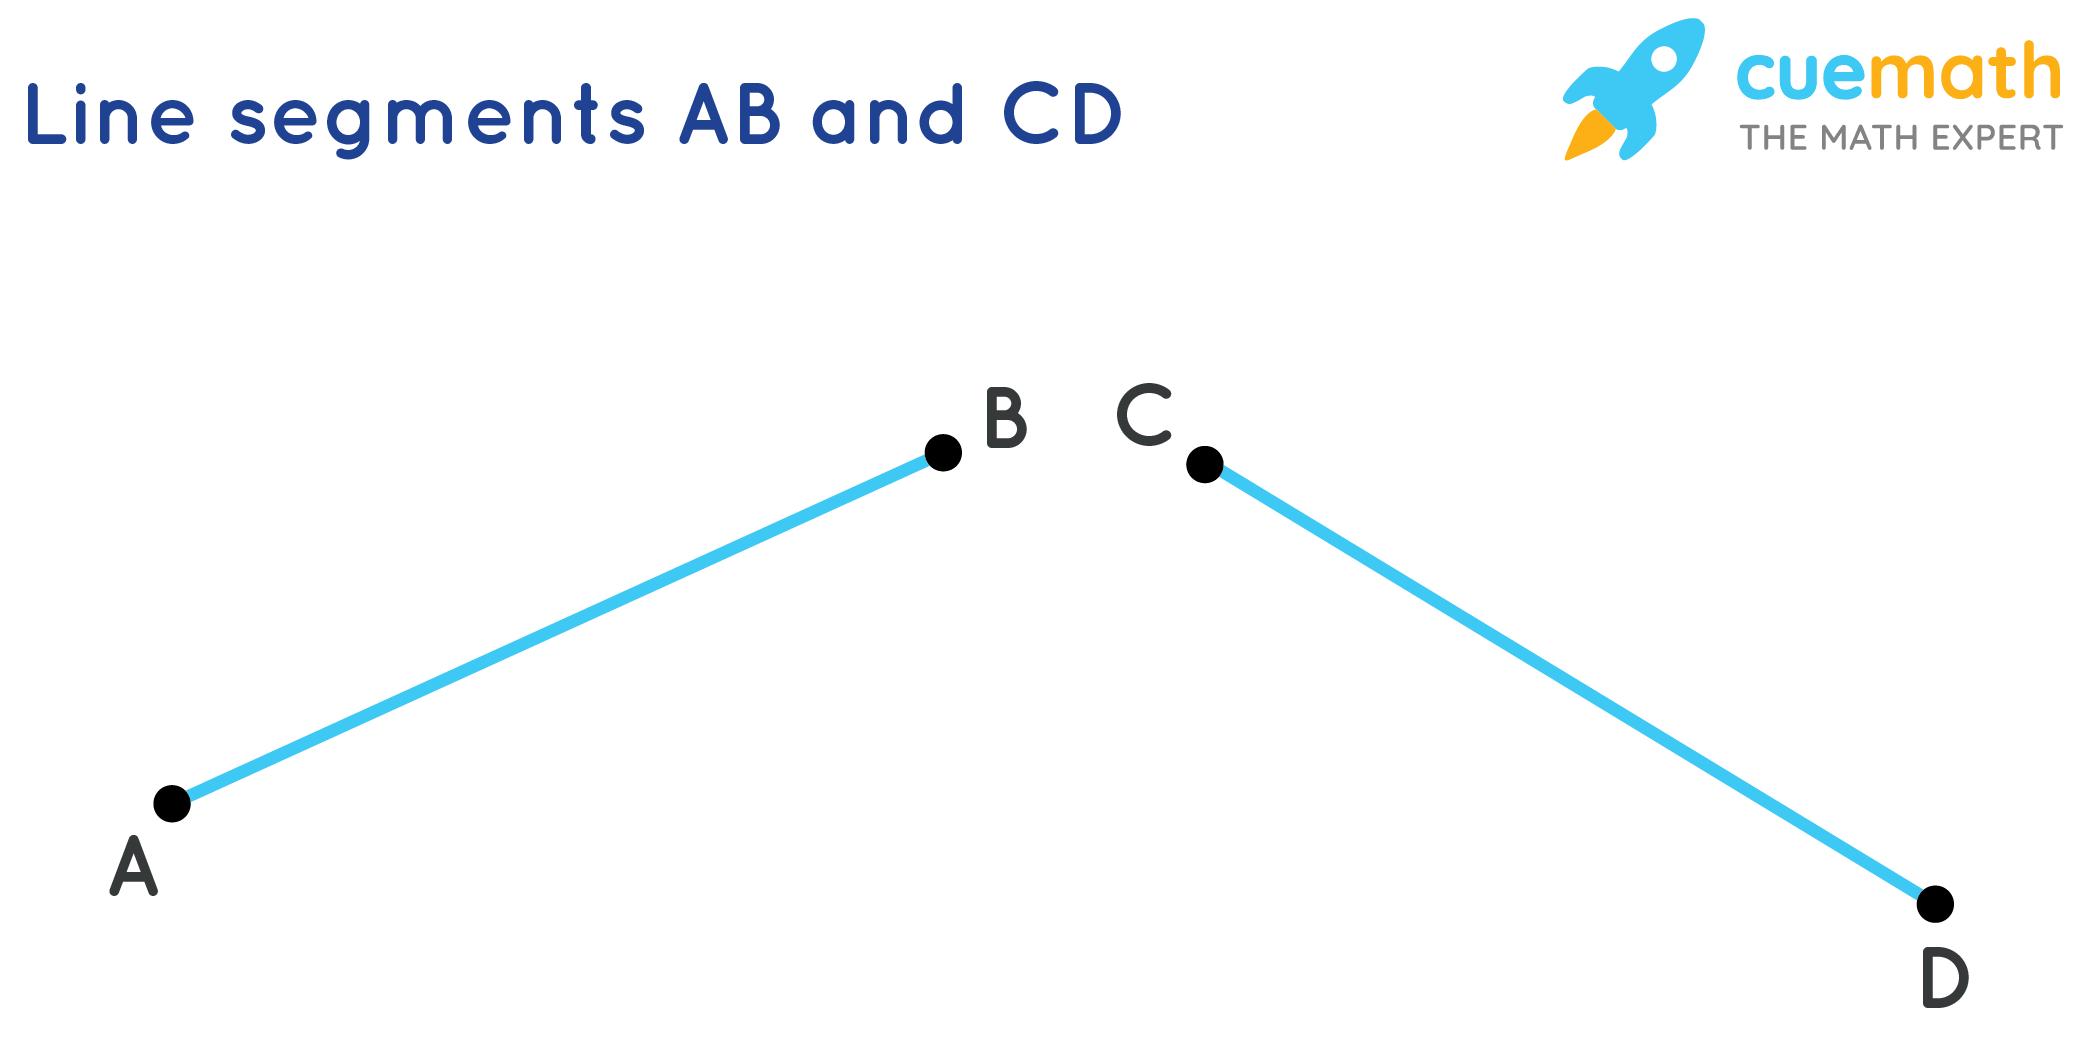 Equal line segments AB and CD